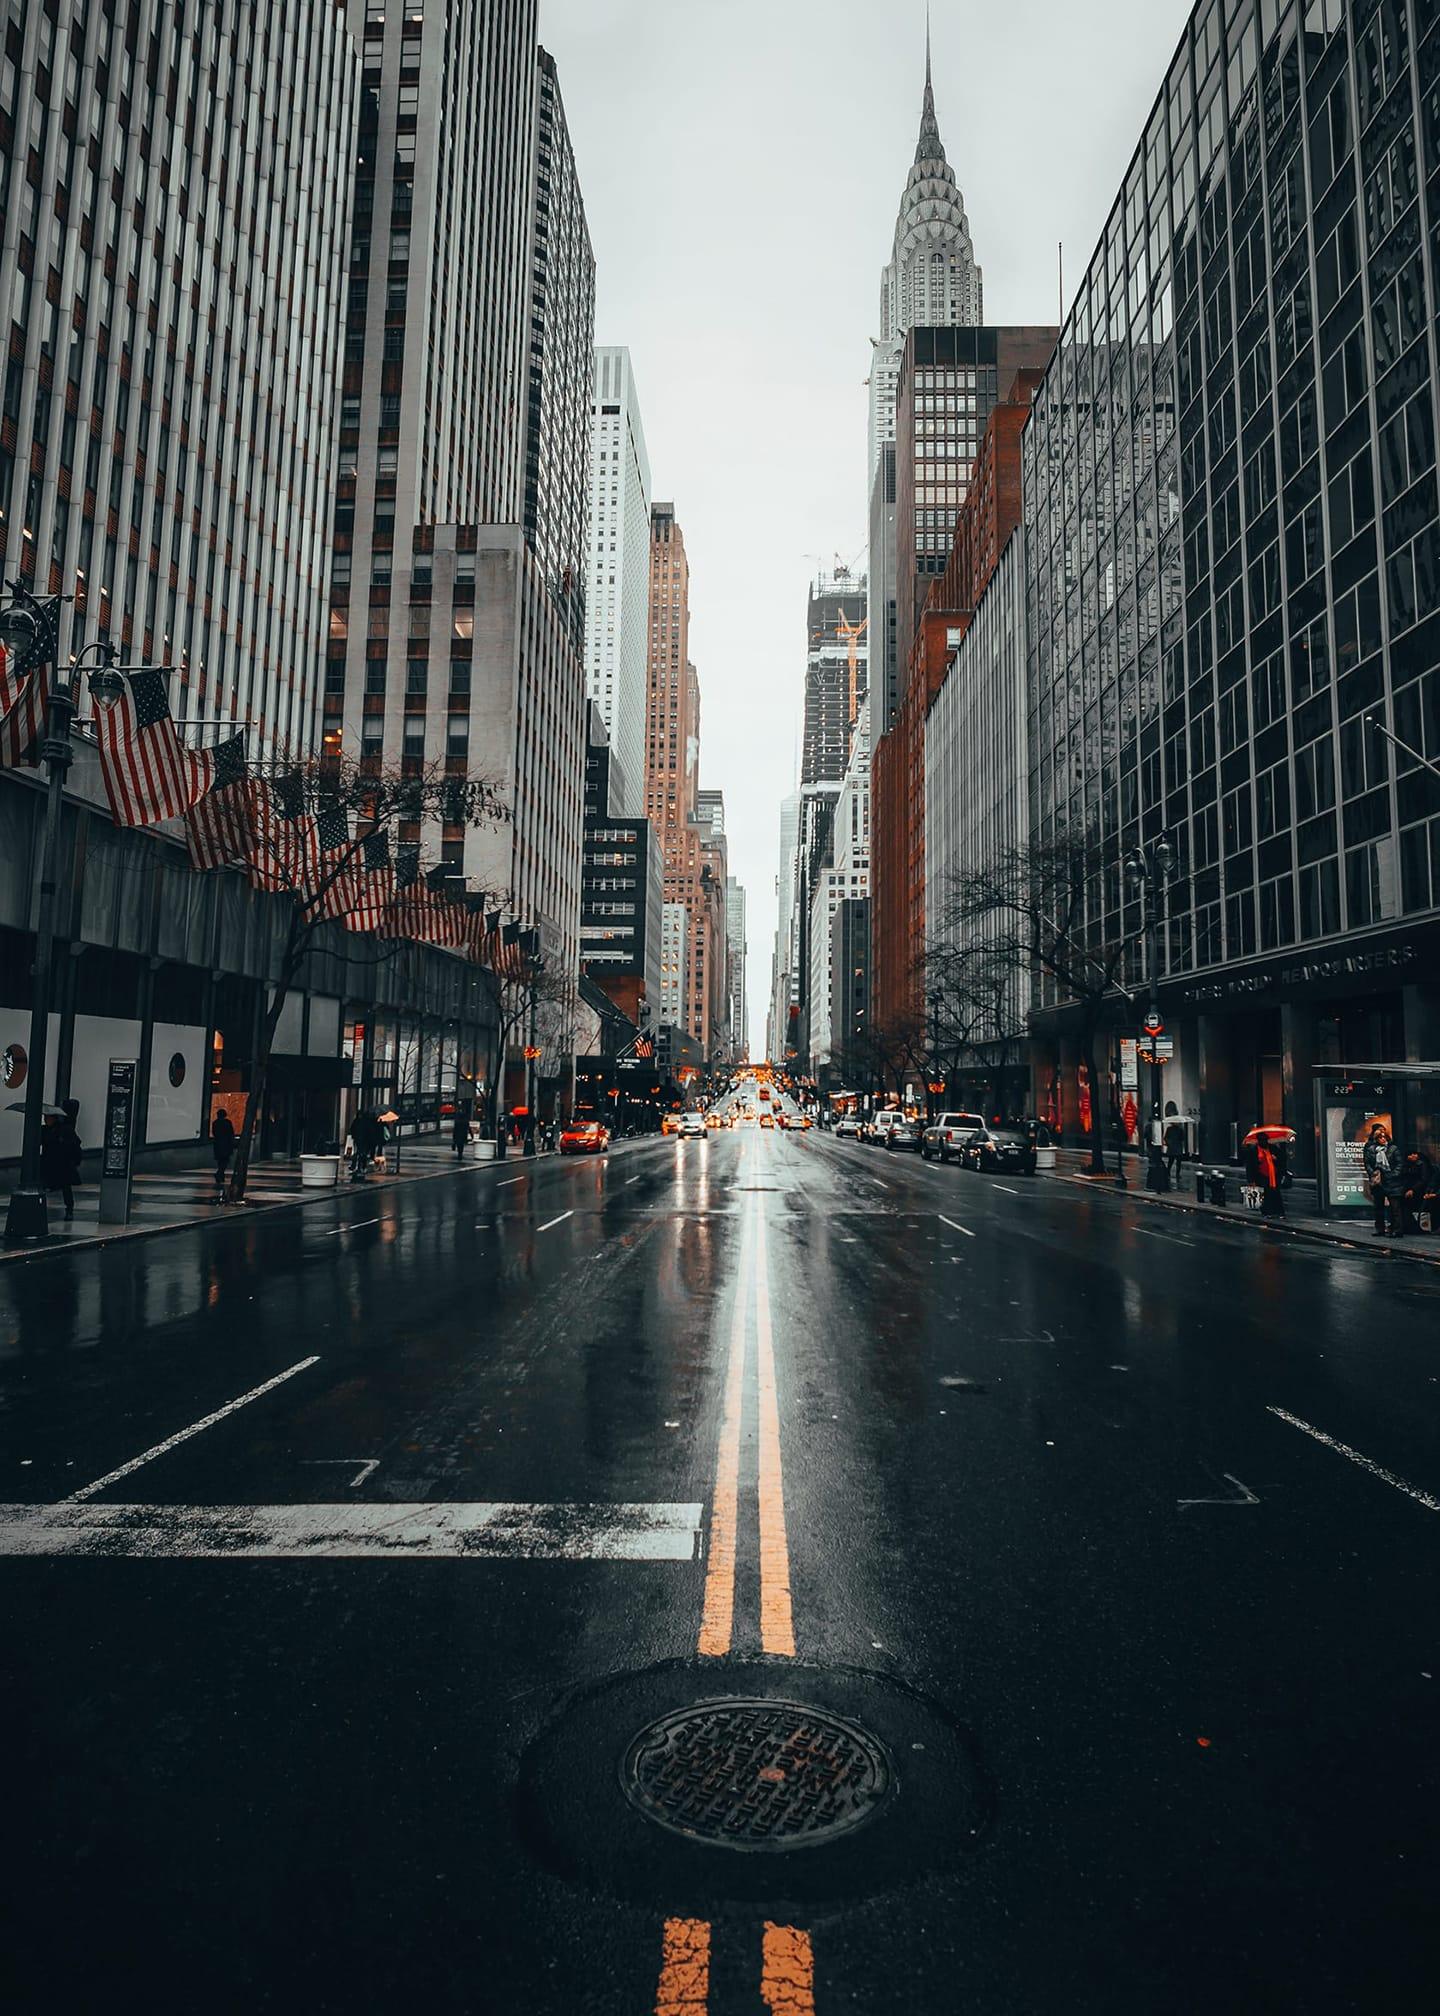 Urbania - Before